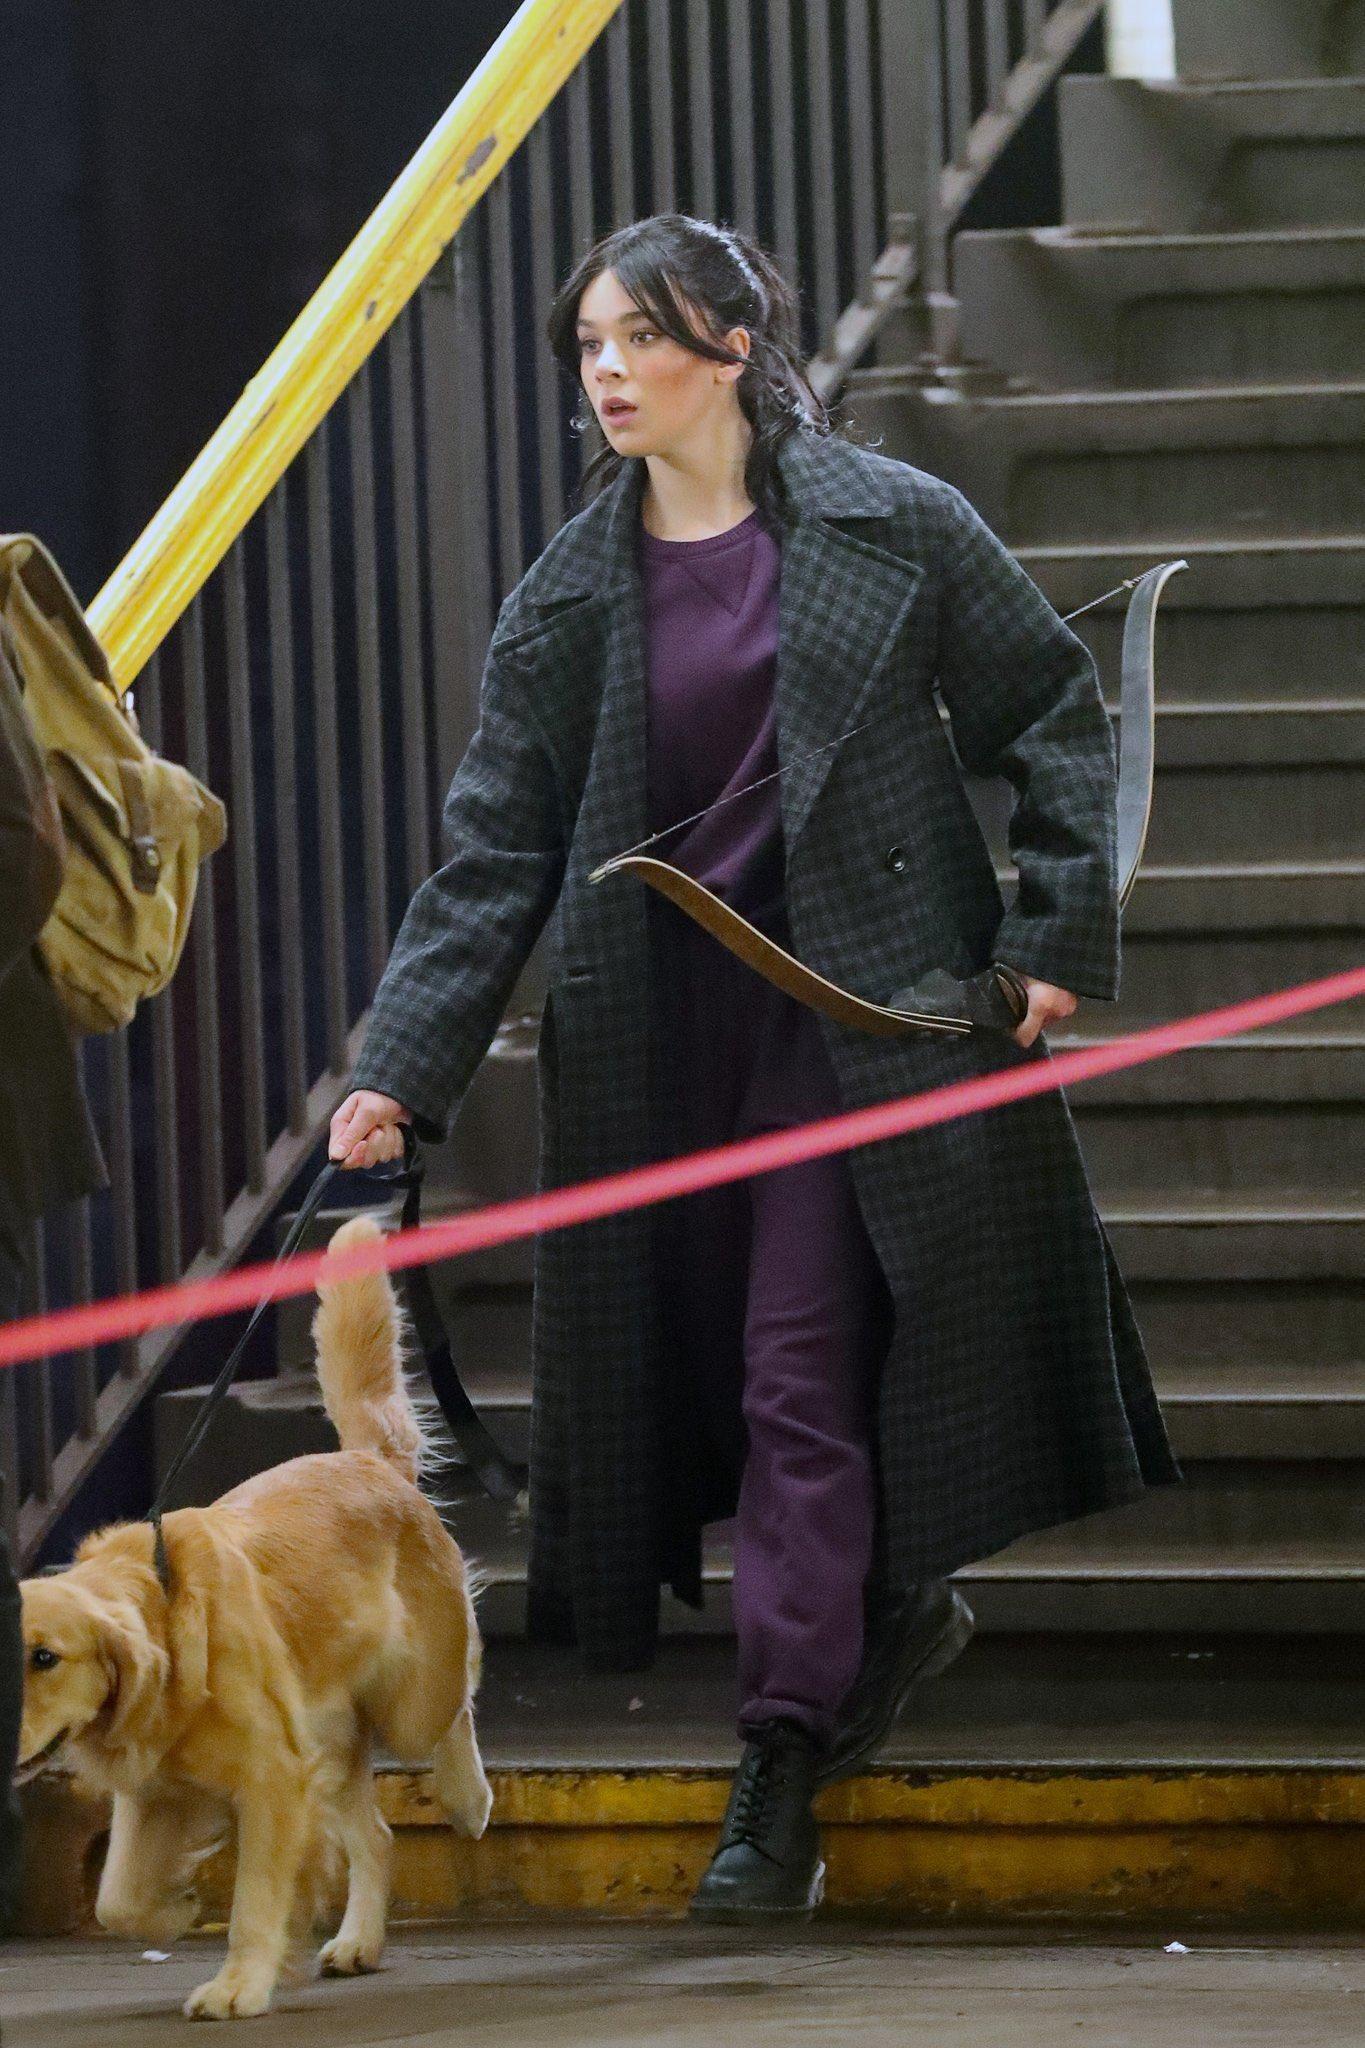 Hawkeye: Primer vistazo a Hailee Steinfeld como Kate Bishop